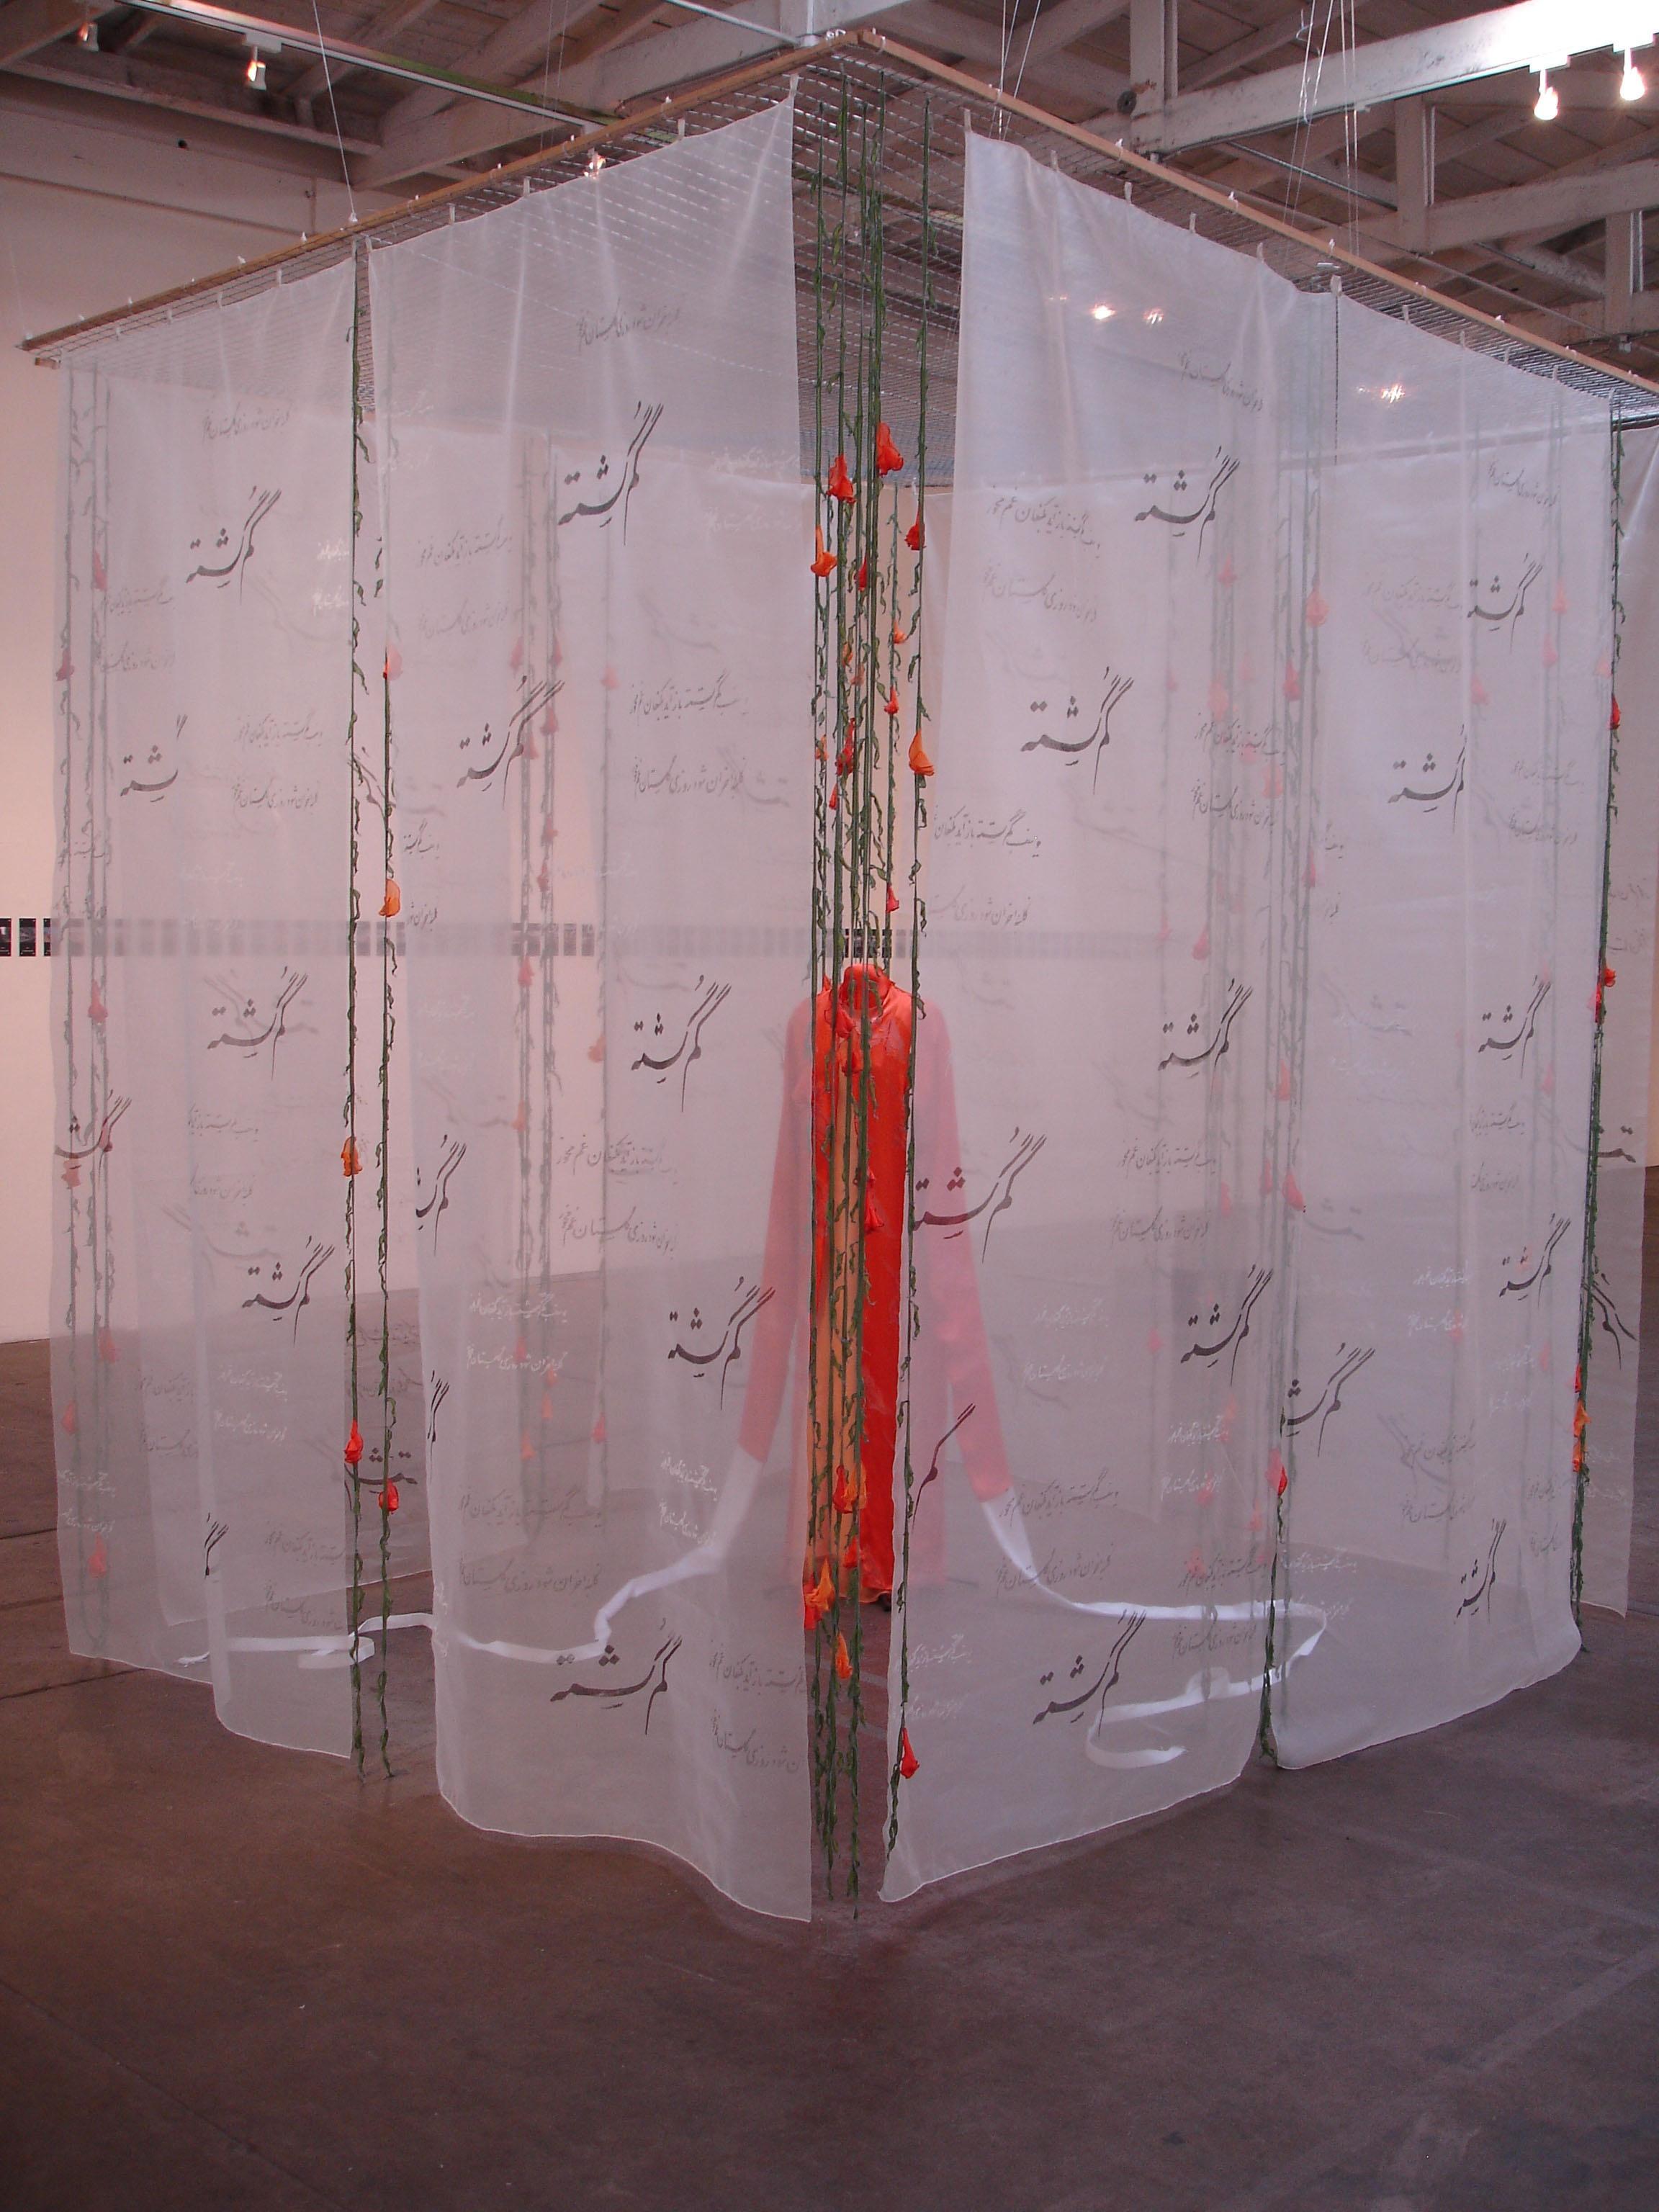 Lost and Wandering (Gomgashteh) installation